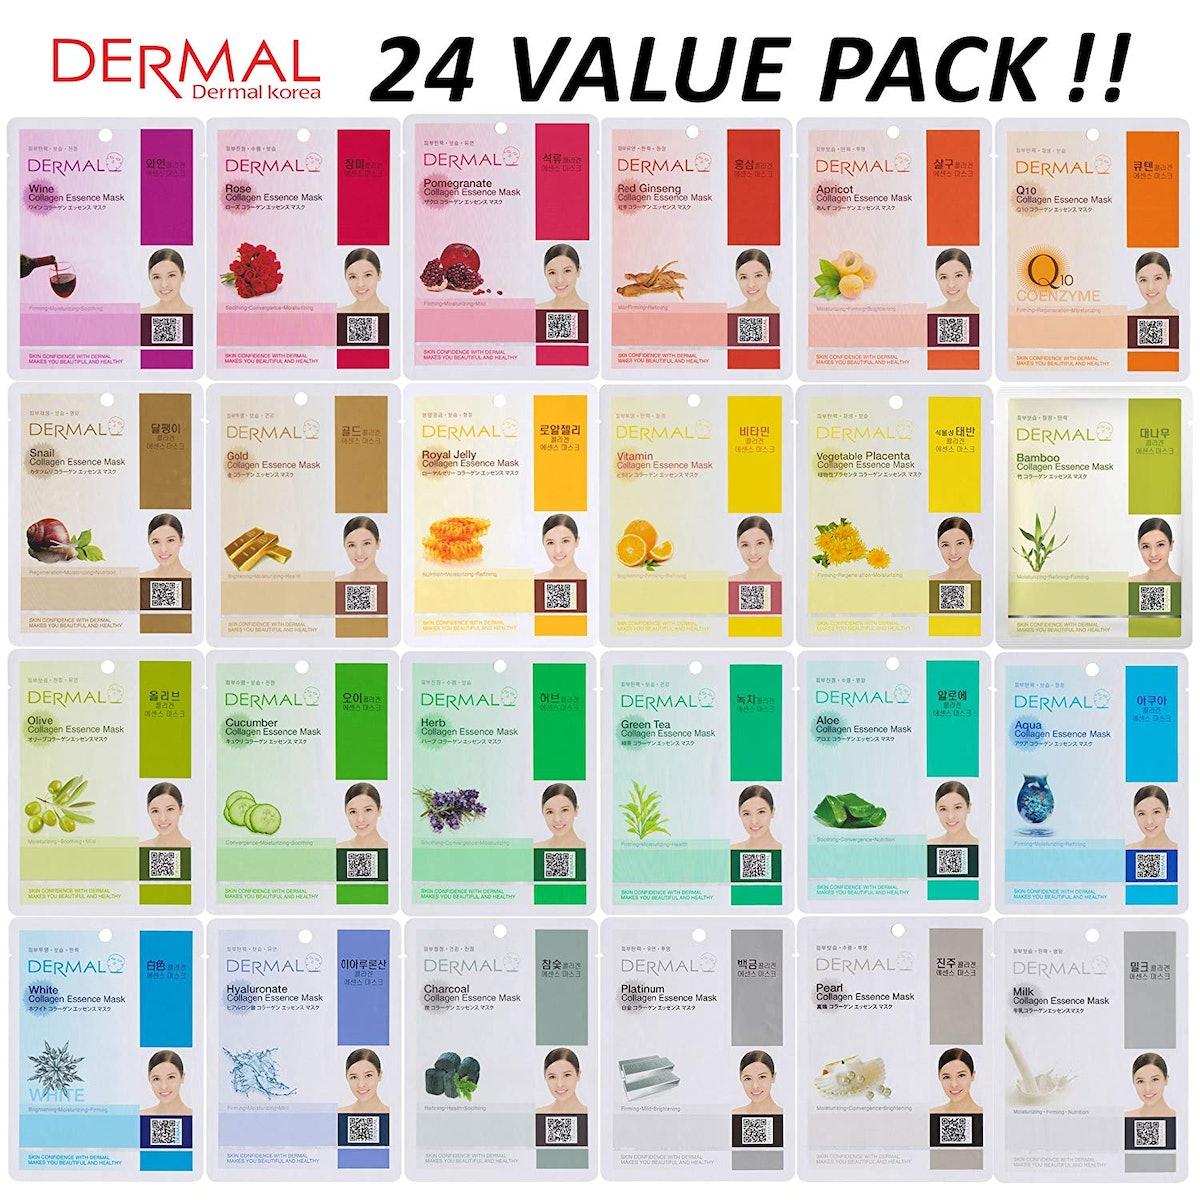 DERMAL Collagen Essence Facial Mask